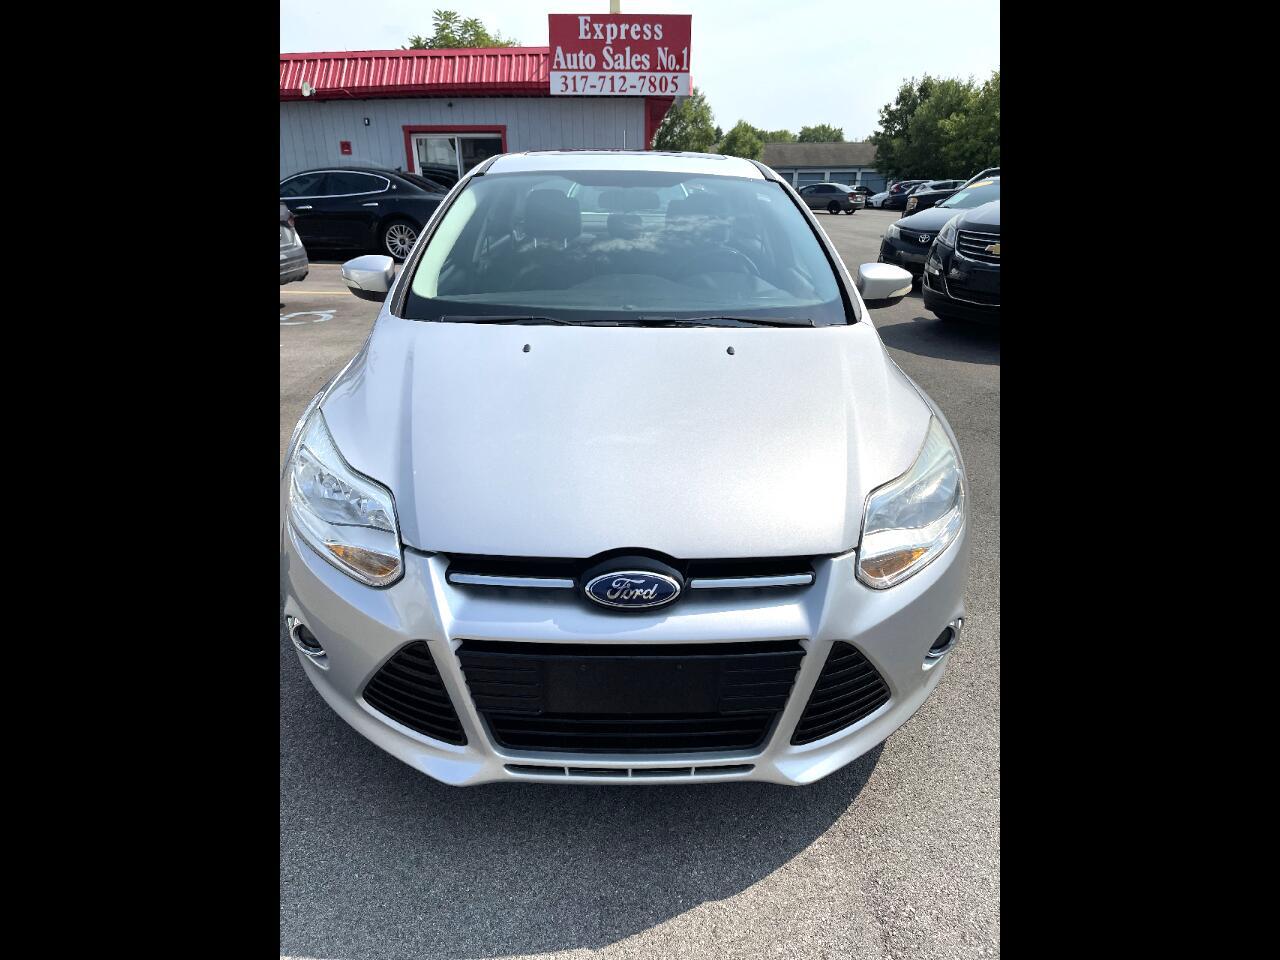 Ford Focus SEL Sedan 2012